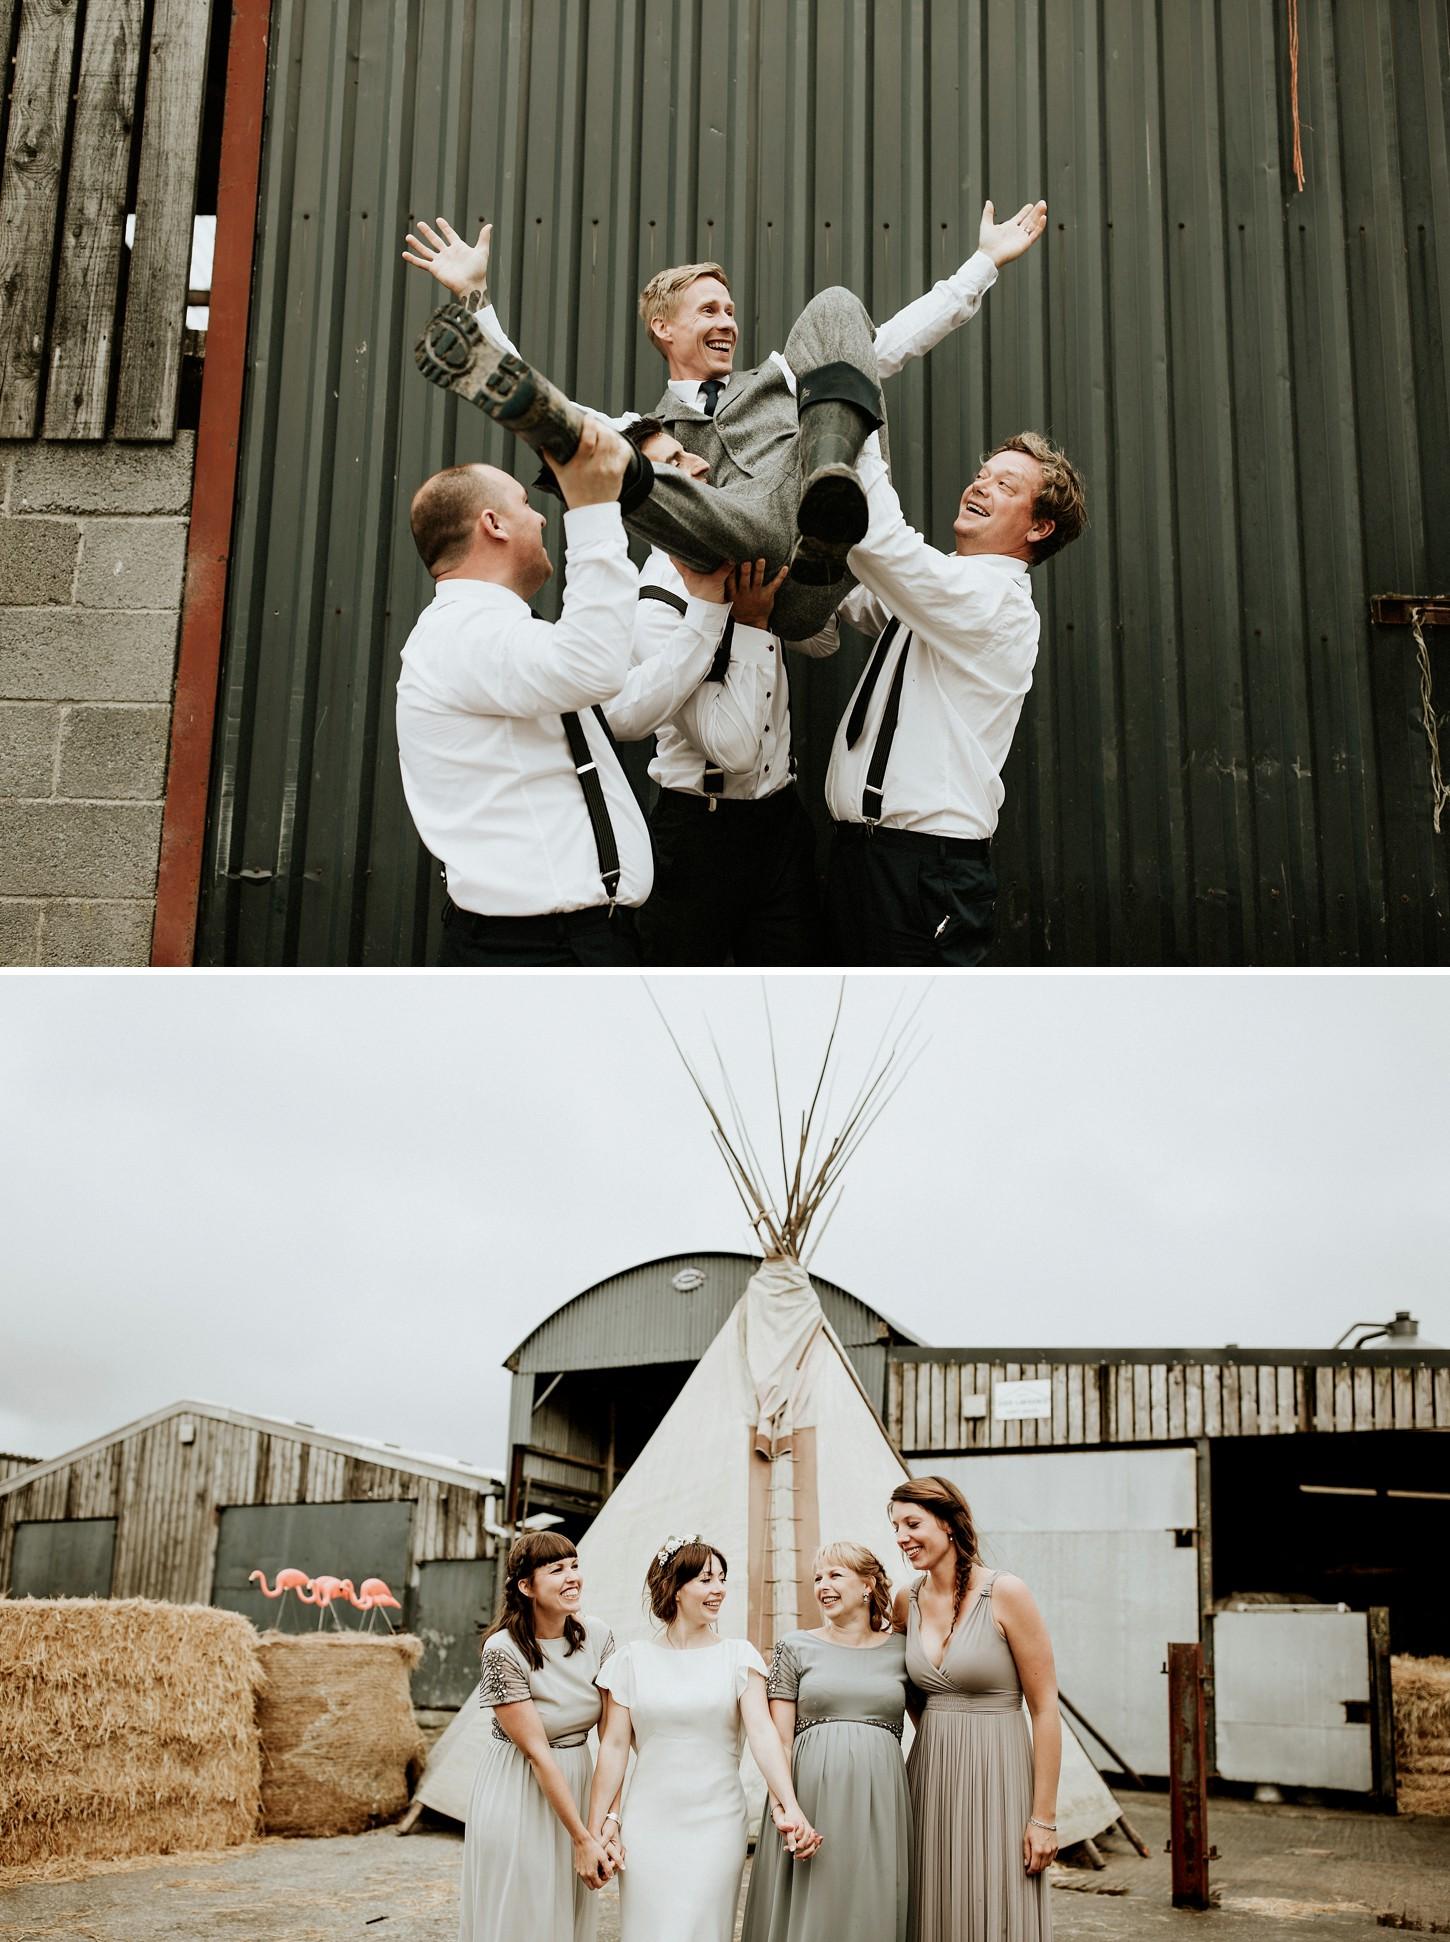 Dolau-Sheep-Farm-Wedding-Wales-United-Kingdom-056